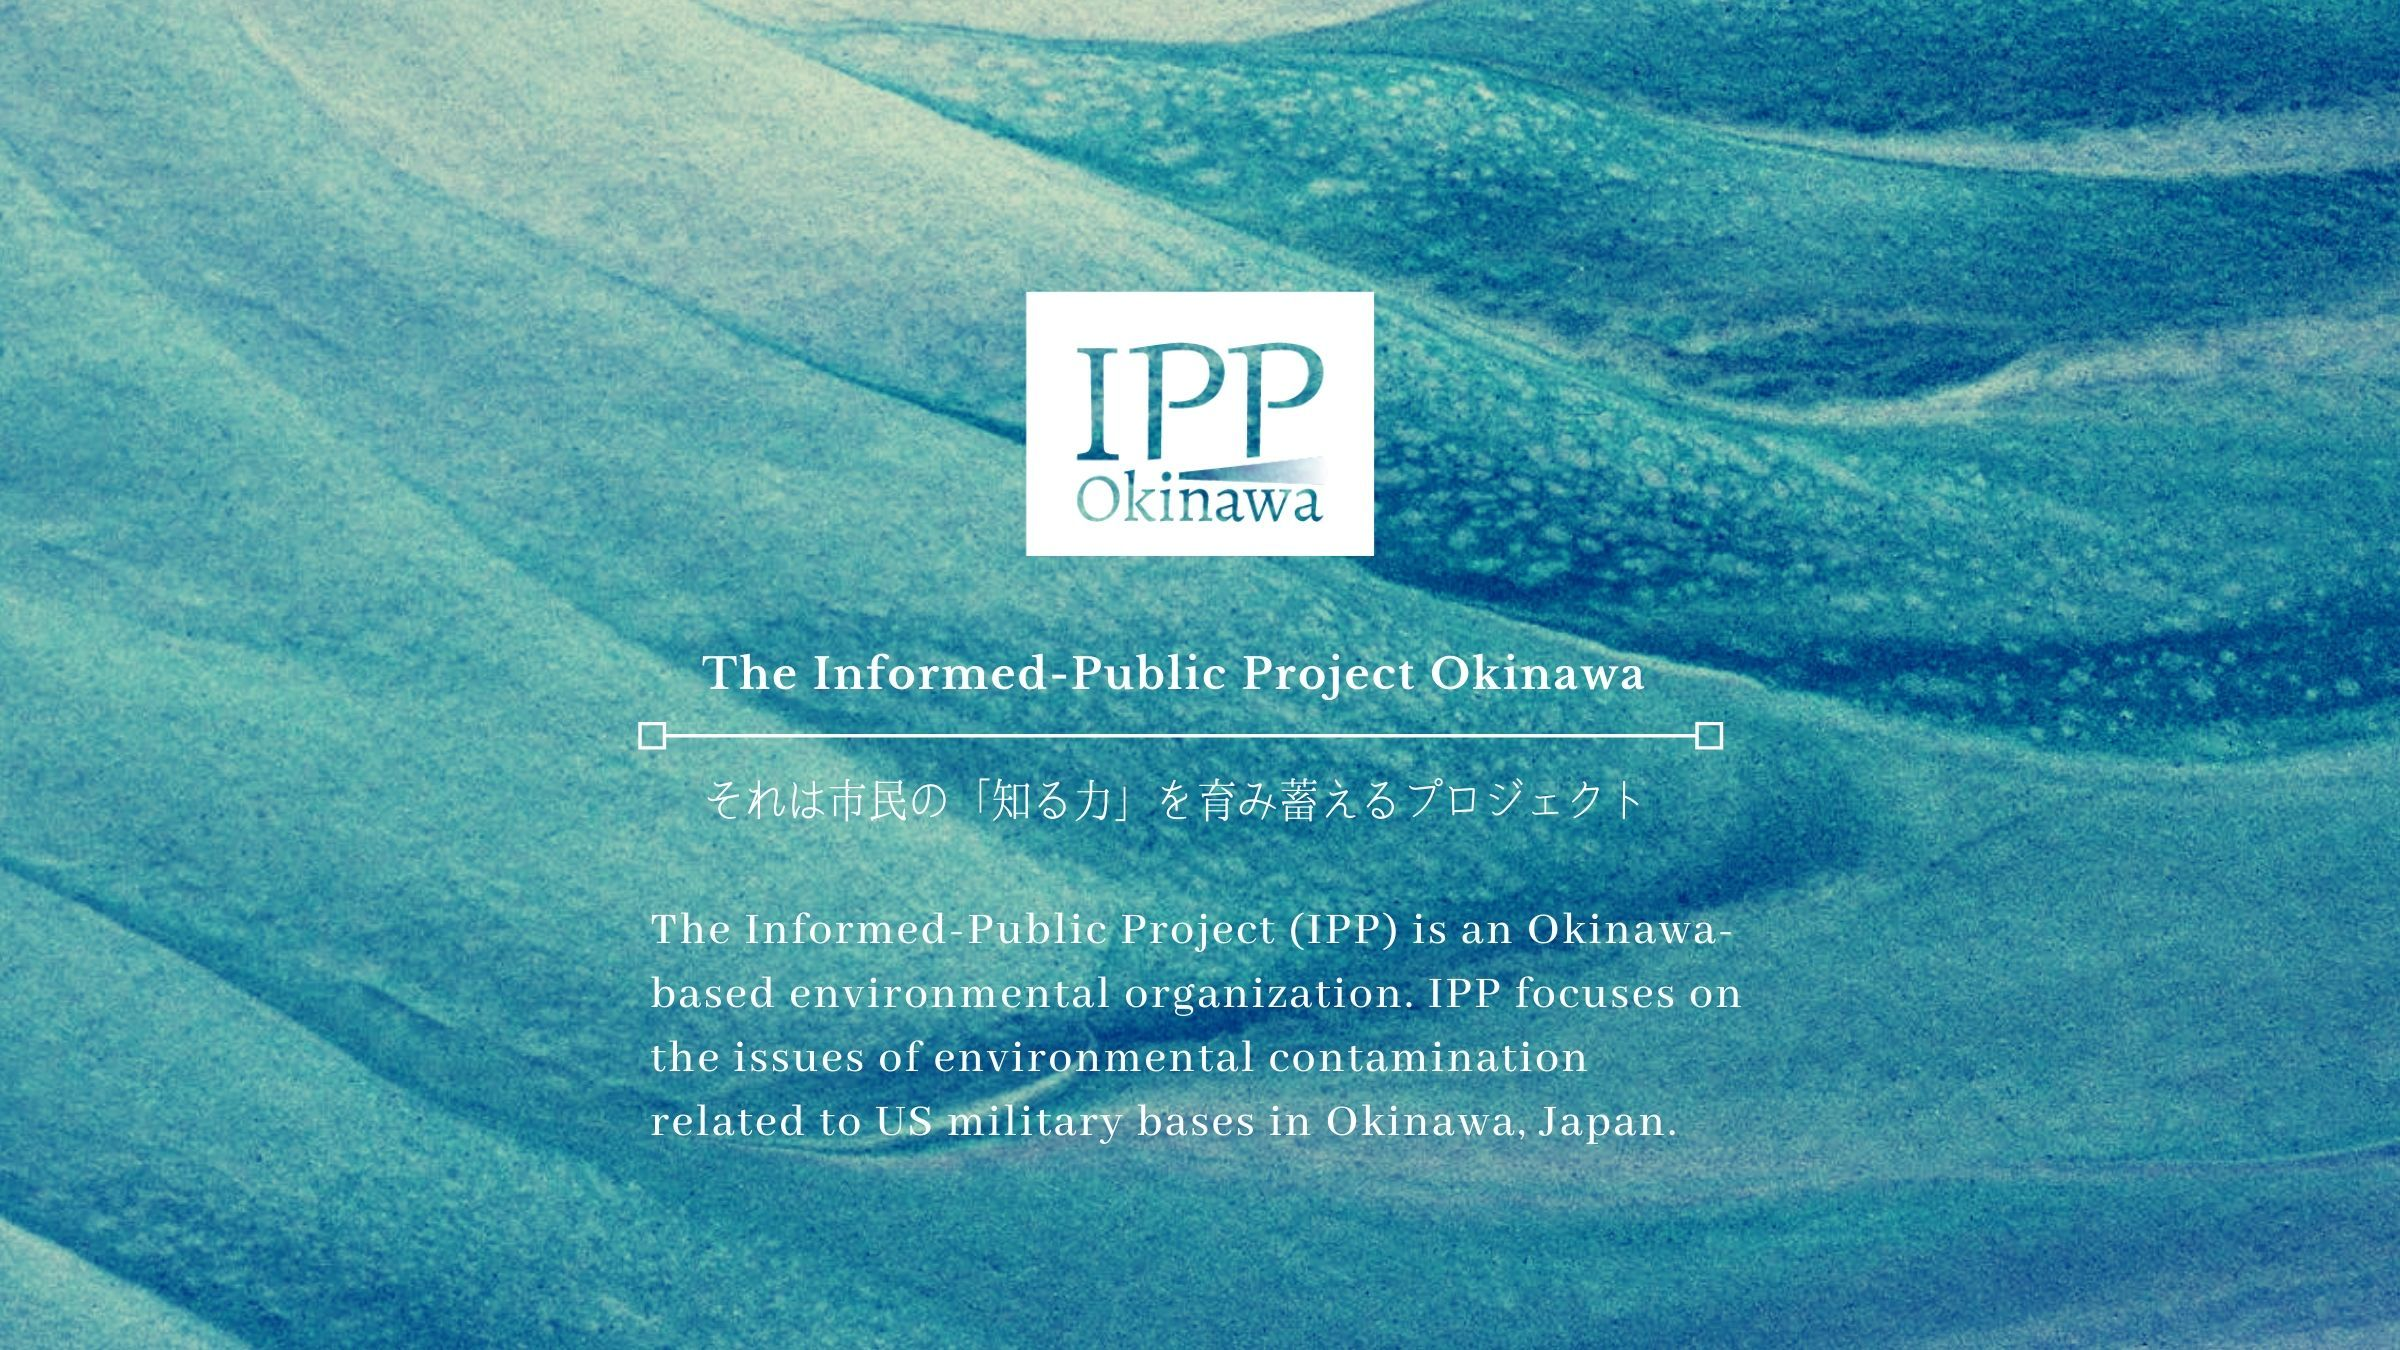 IPP Okinawaとは